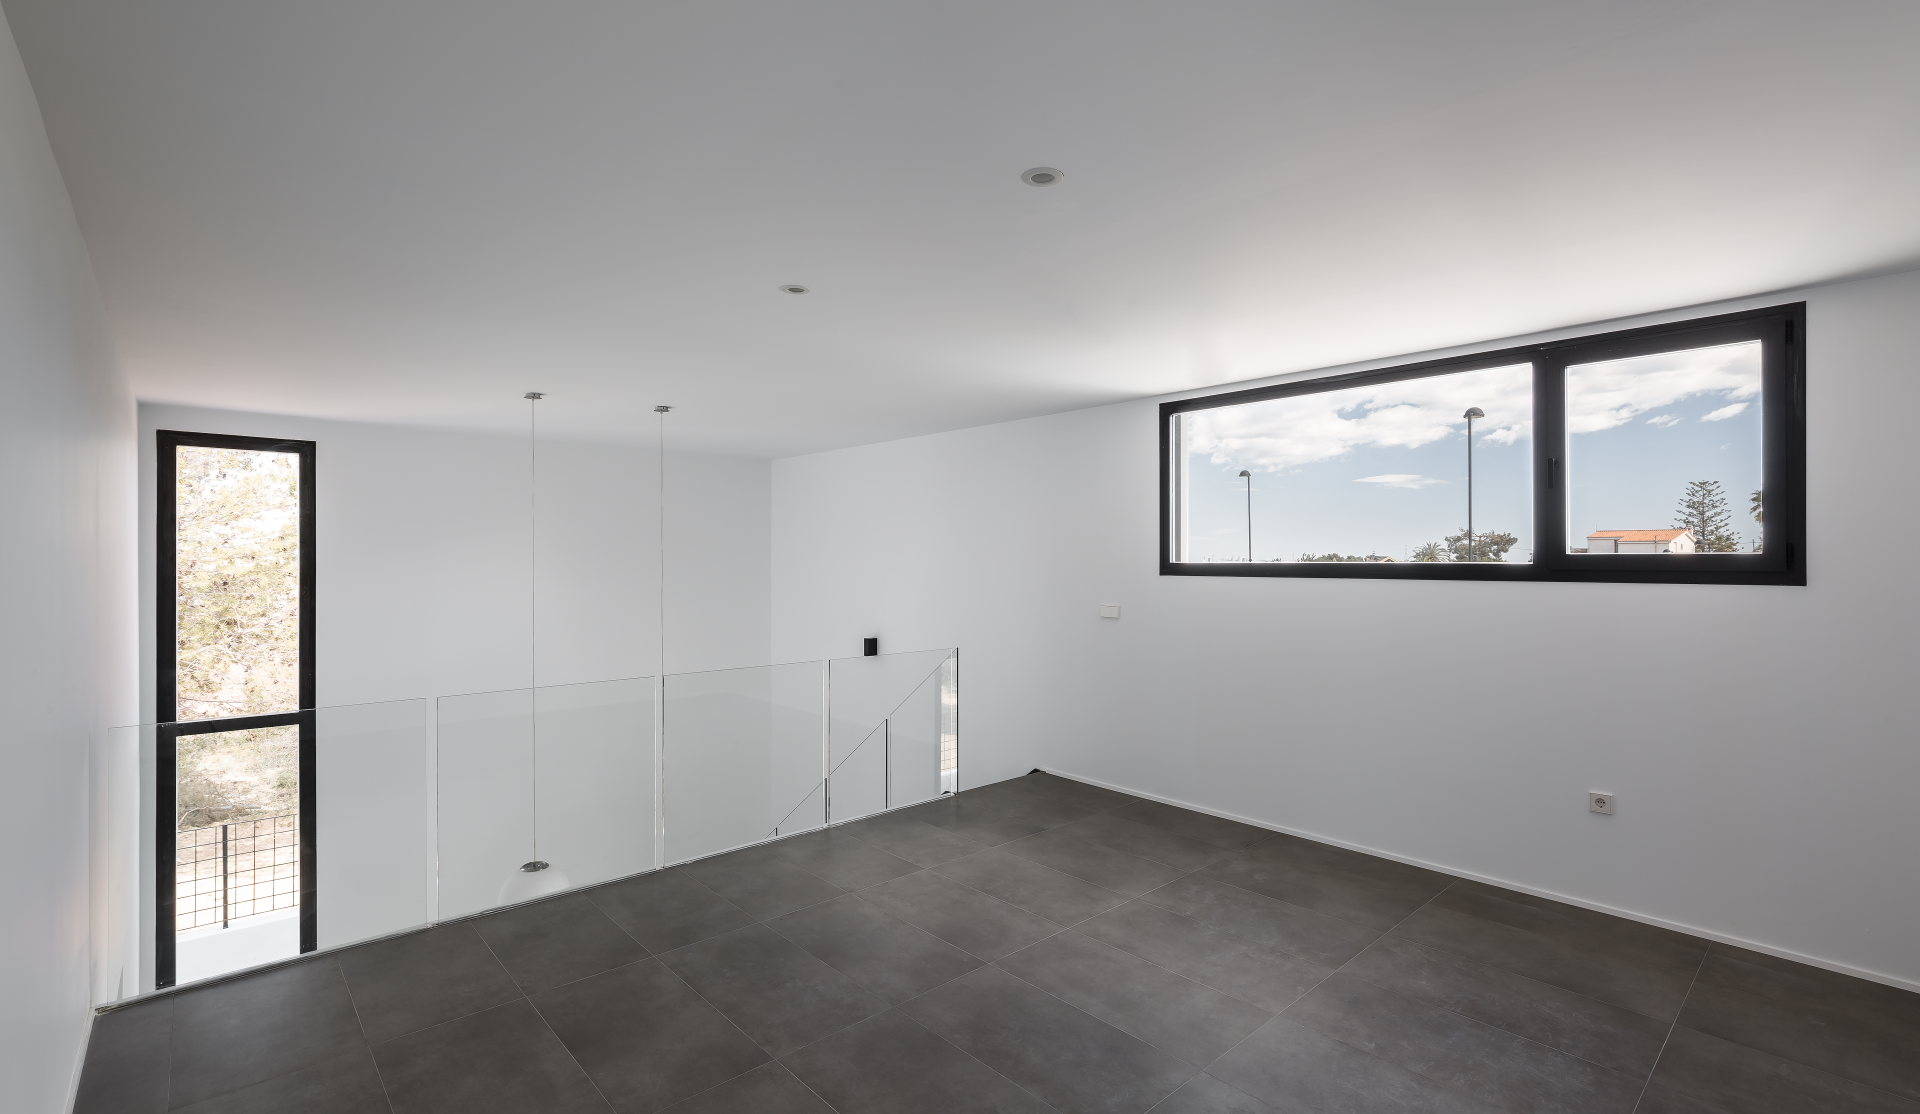 fotografia-arquitectura-valencia-german-cabo-viraje-el-vedat-torrent (25)